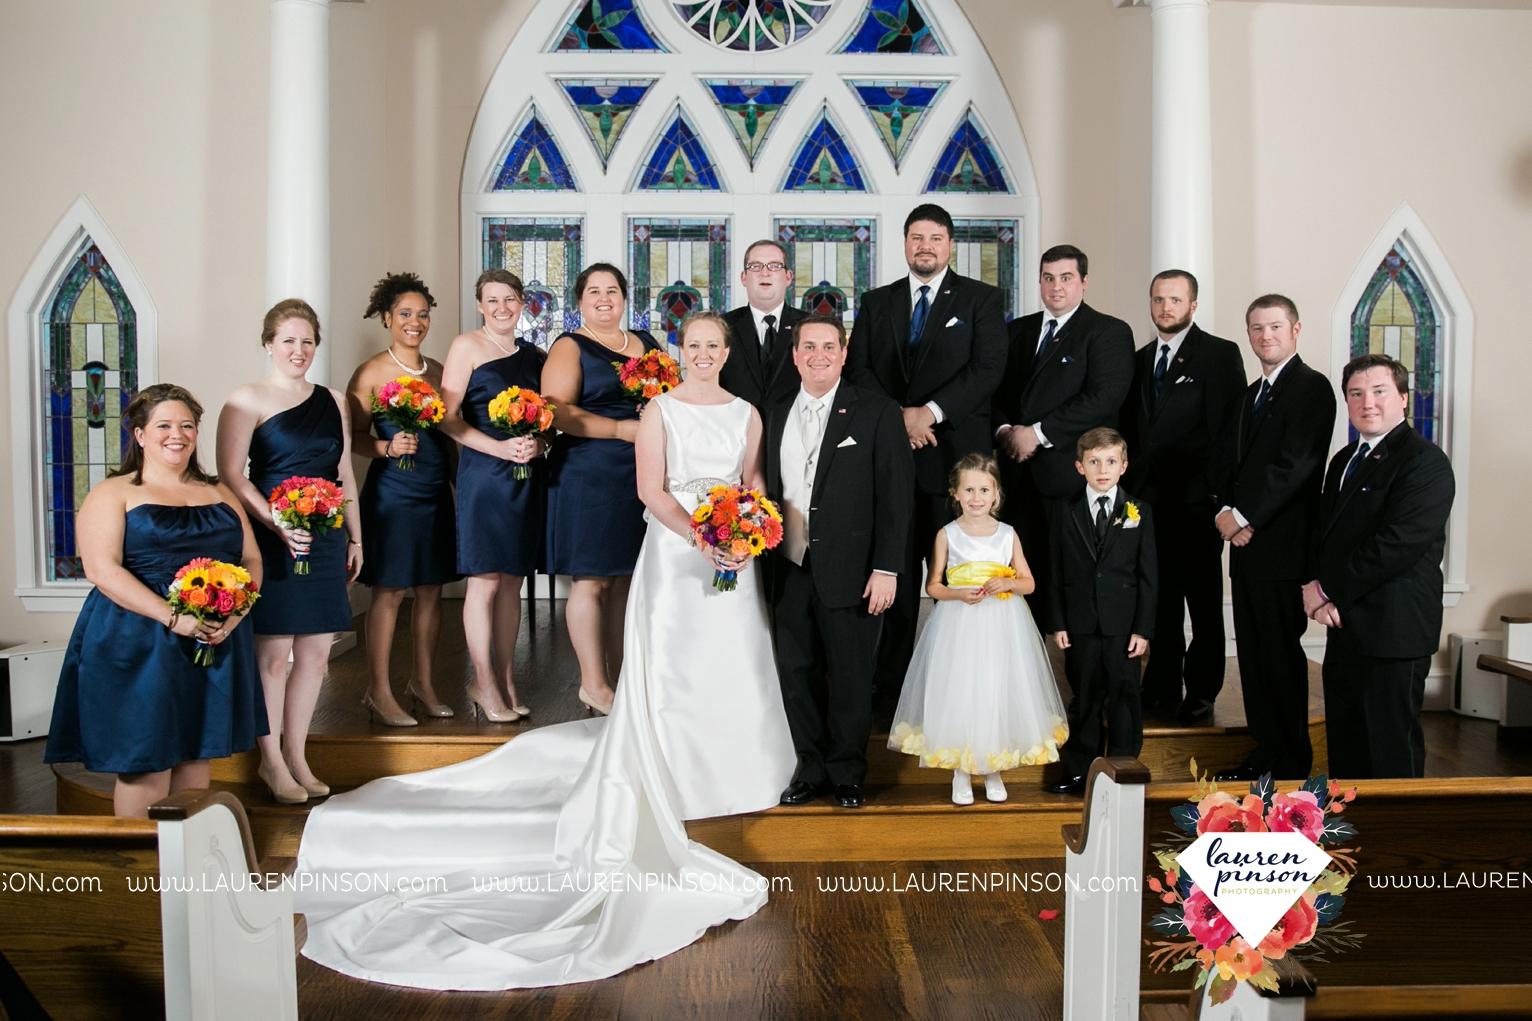 bells-texas-wedding-photography-at-willowood-ranch-chapel-north-texas-wichita-falls-wedding-photographer_1882.jpg